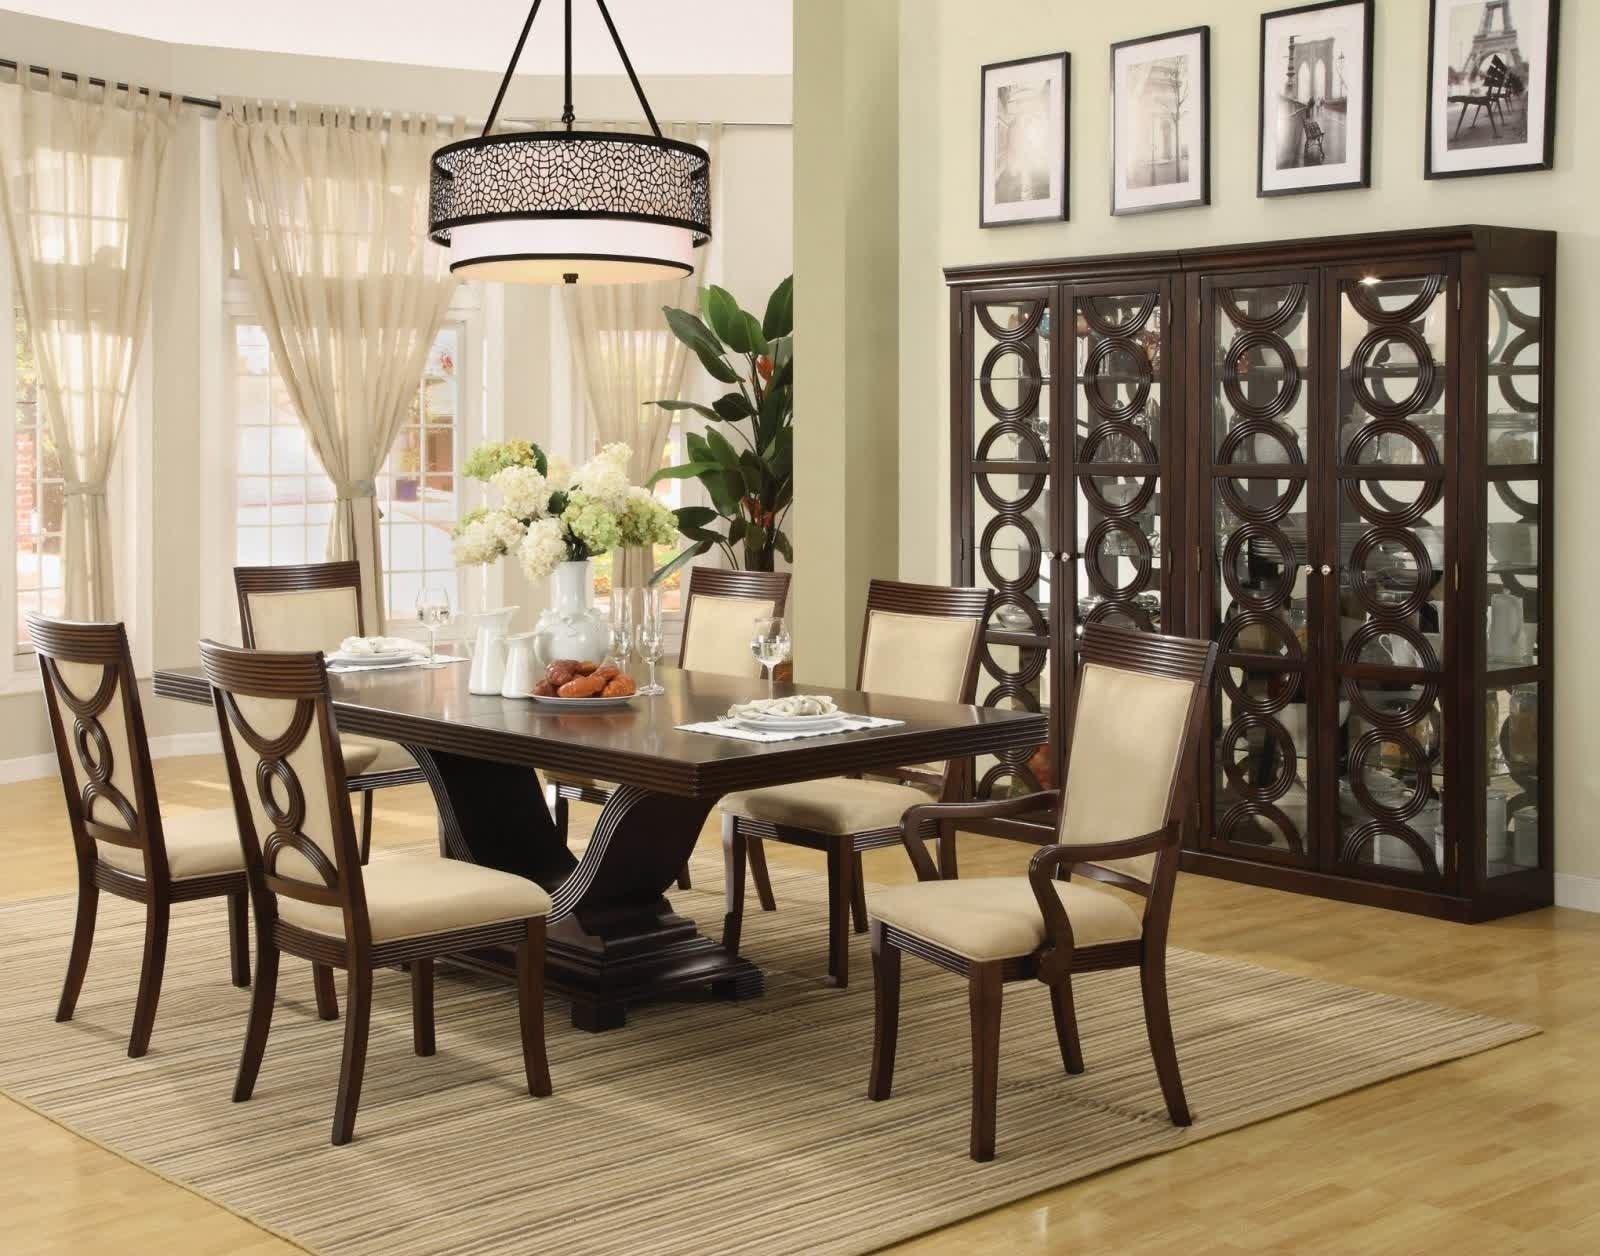 10 Lovable Centerpiece Ideas For Dining Room Table modern and nice centerpiece ideas for dining room table zachary 2020